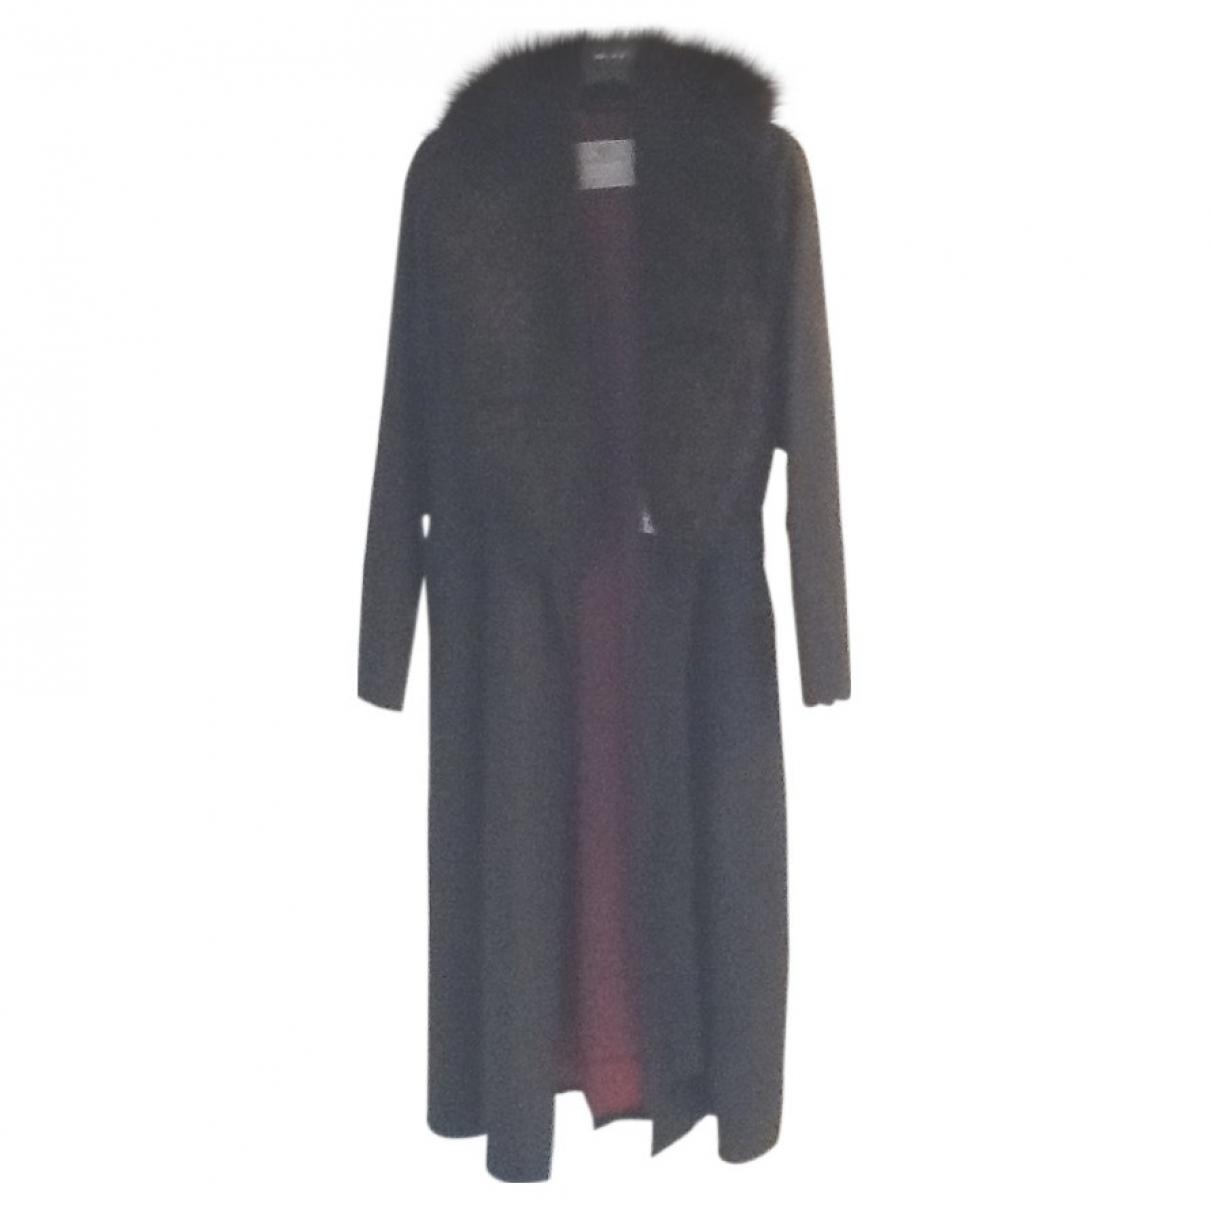 Aquascutum \N Black coat for Women L International